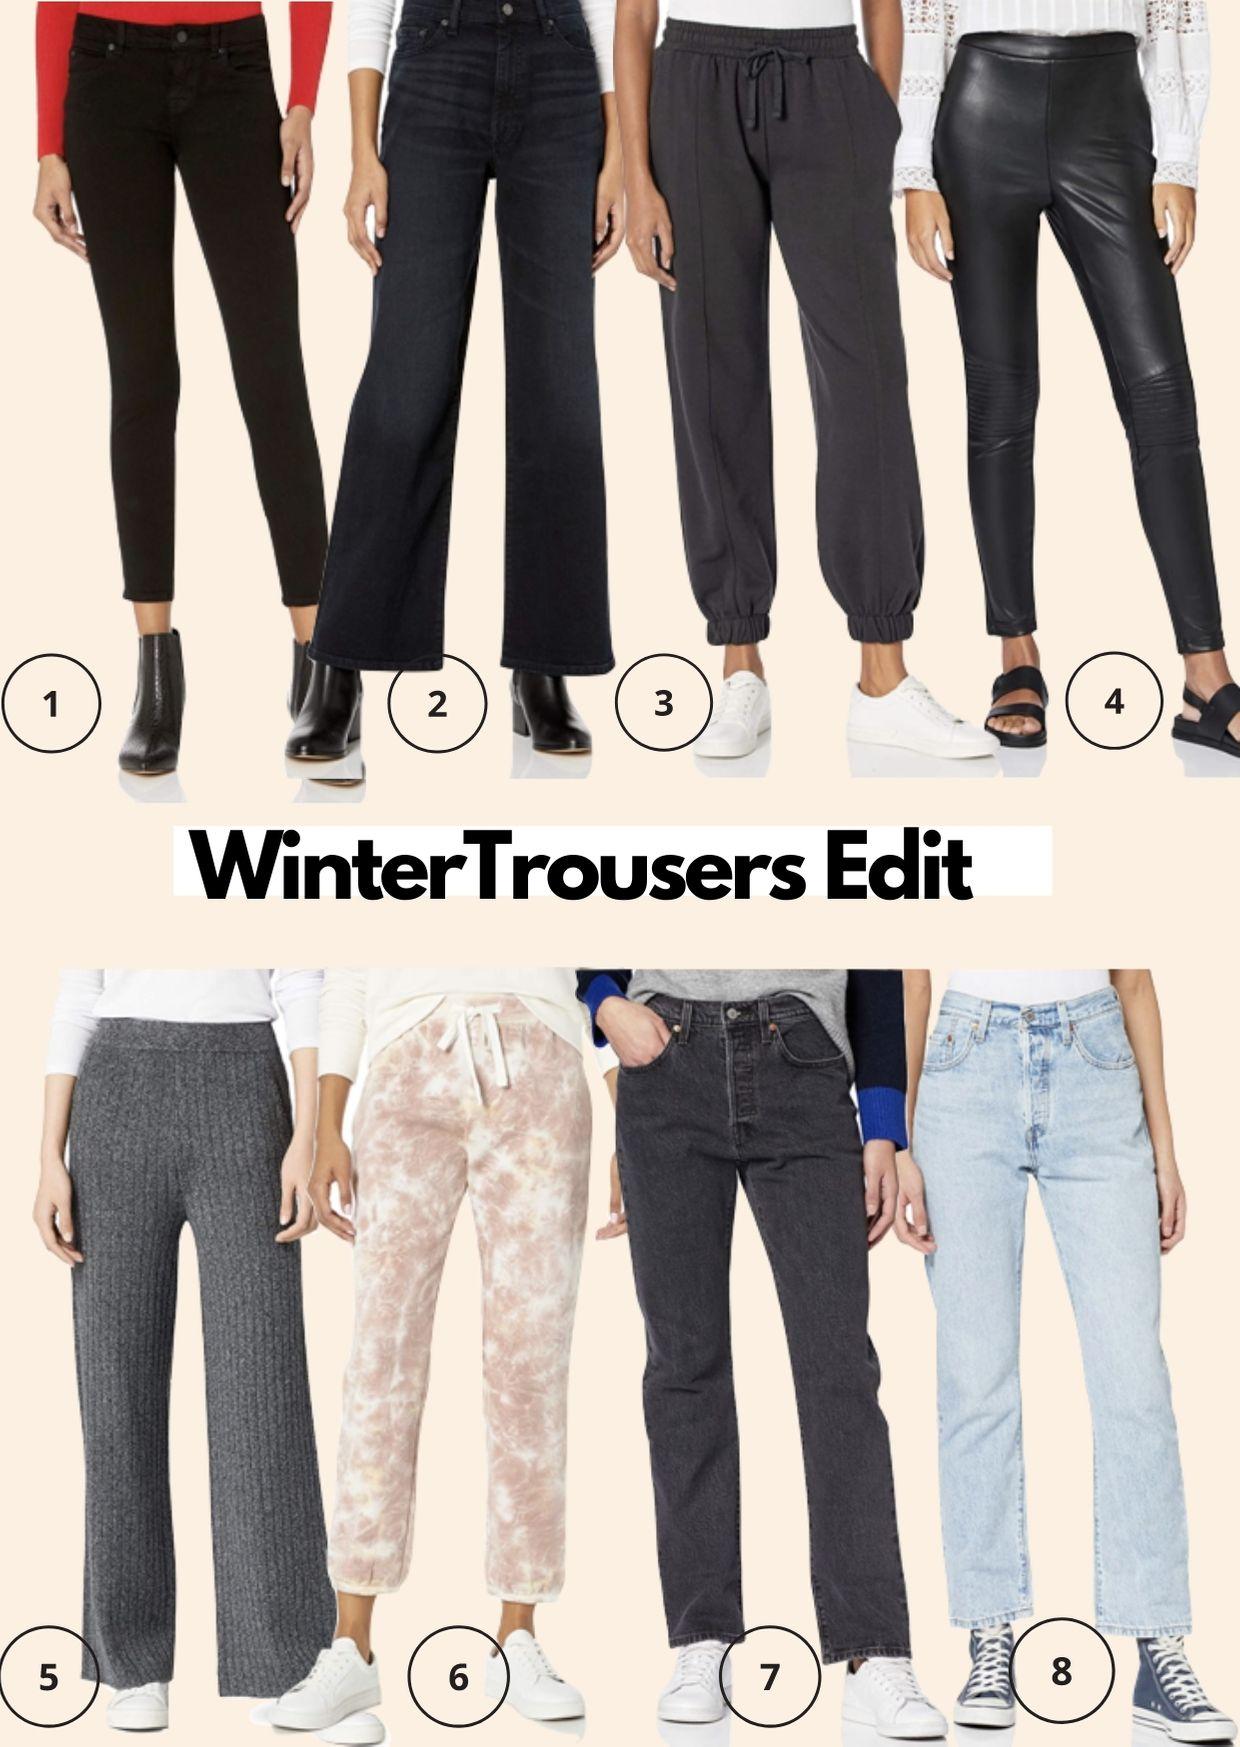 Amazon Fashion Winter Trousers Edit